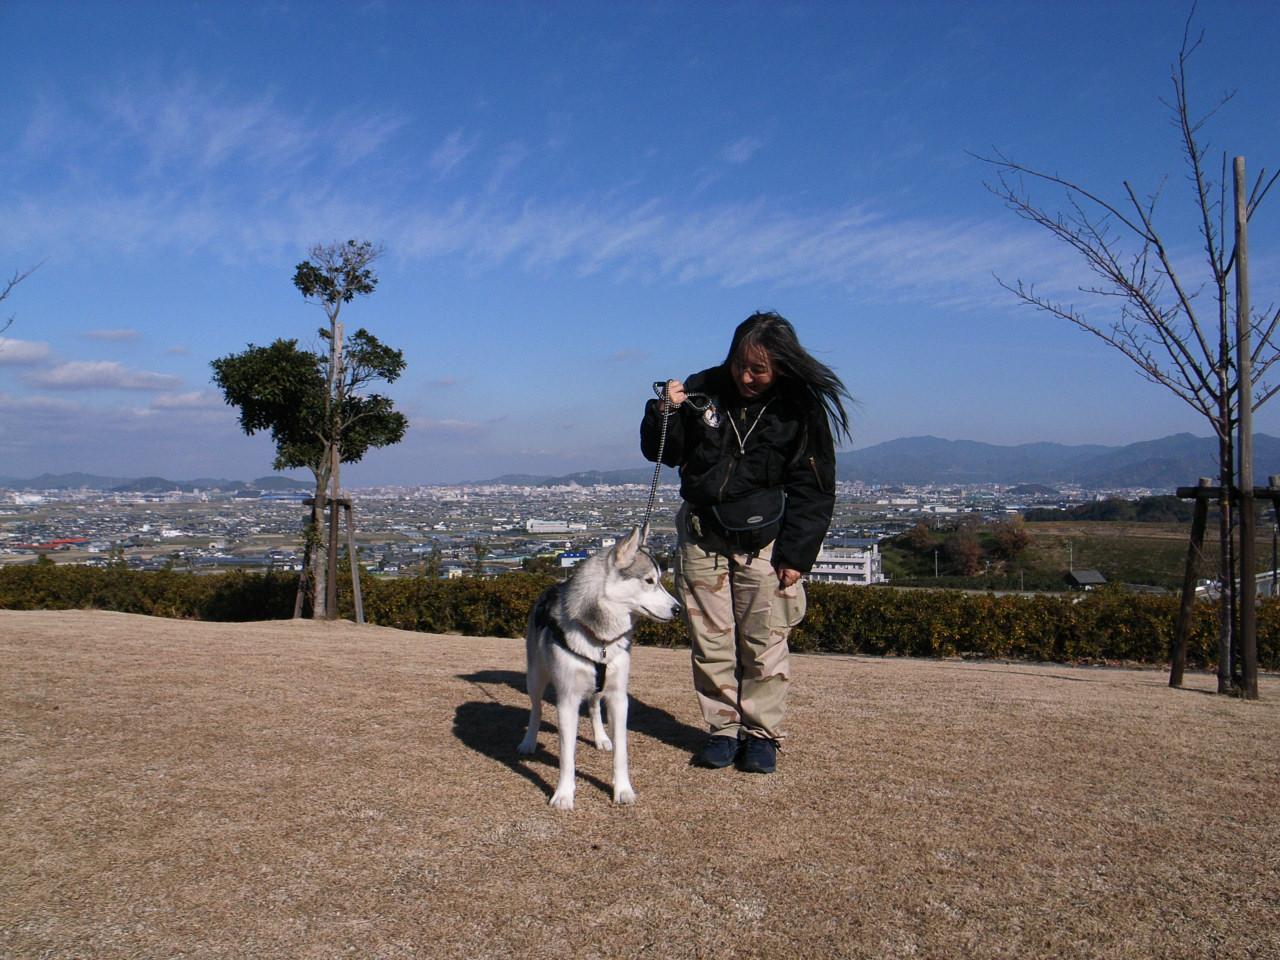 Shikoku Pilgrimage with Hana2  Dec.25th 2005_c0049299_1401789.jpg